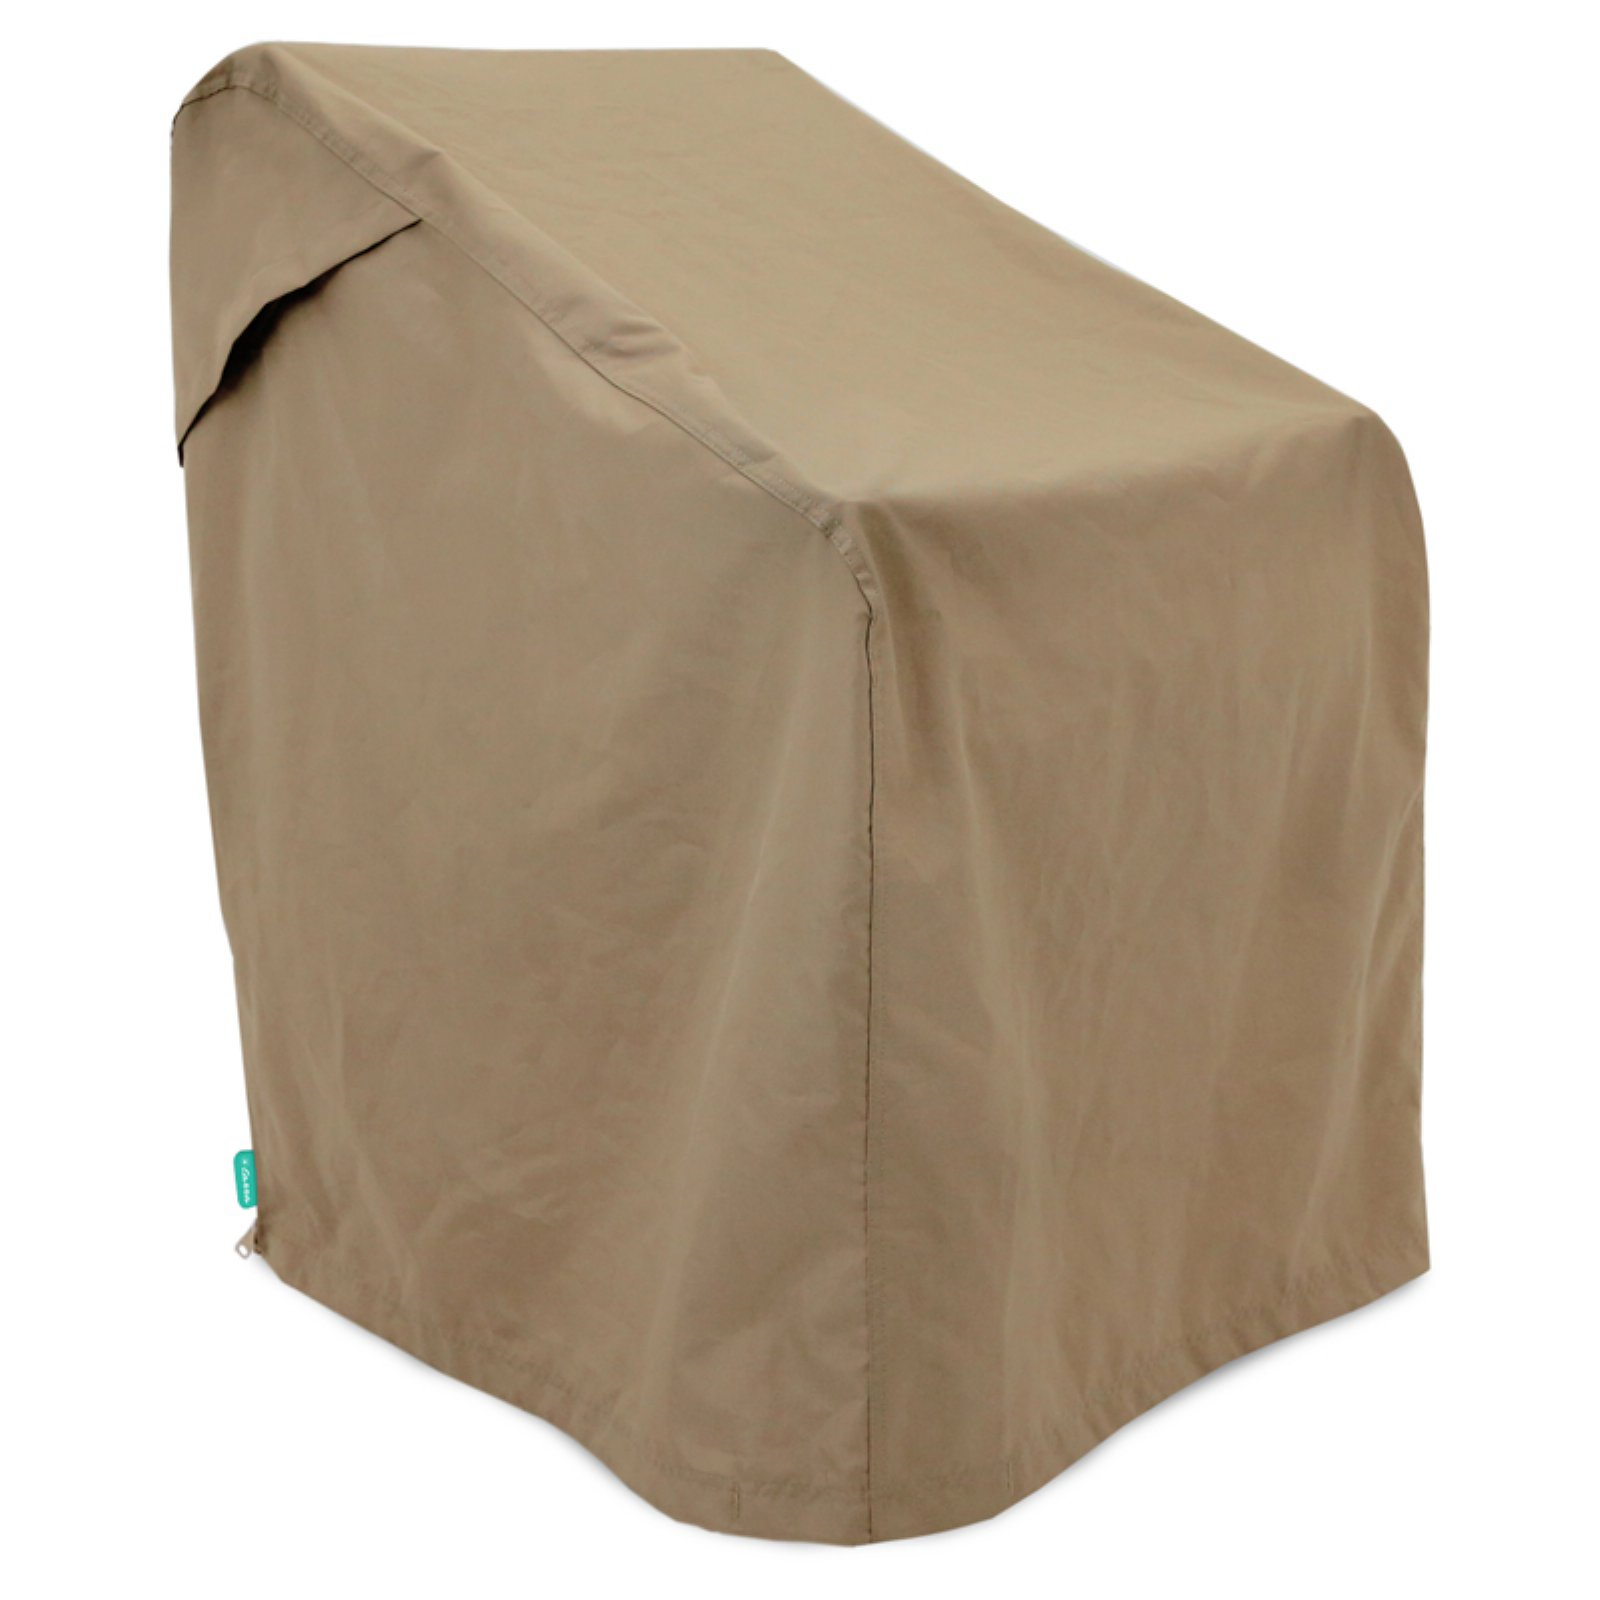 Tarra Home Universal Outdoor UFCCP323132PT Patio Chair Cover